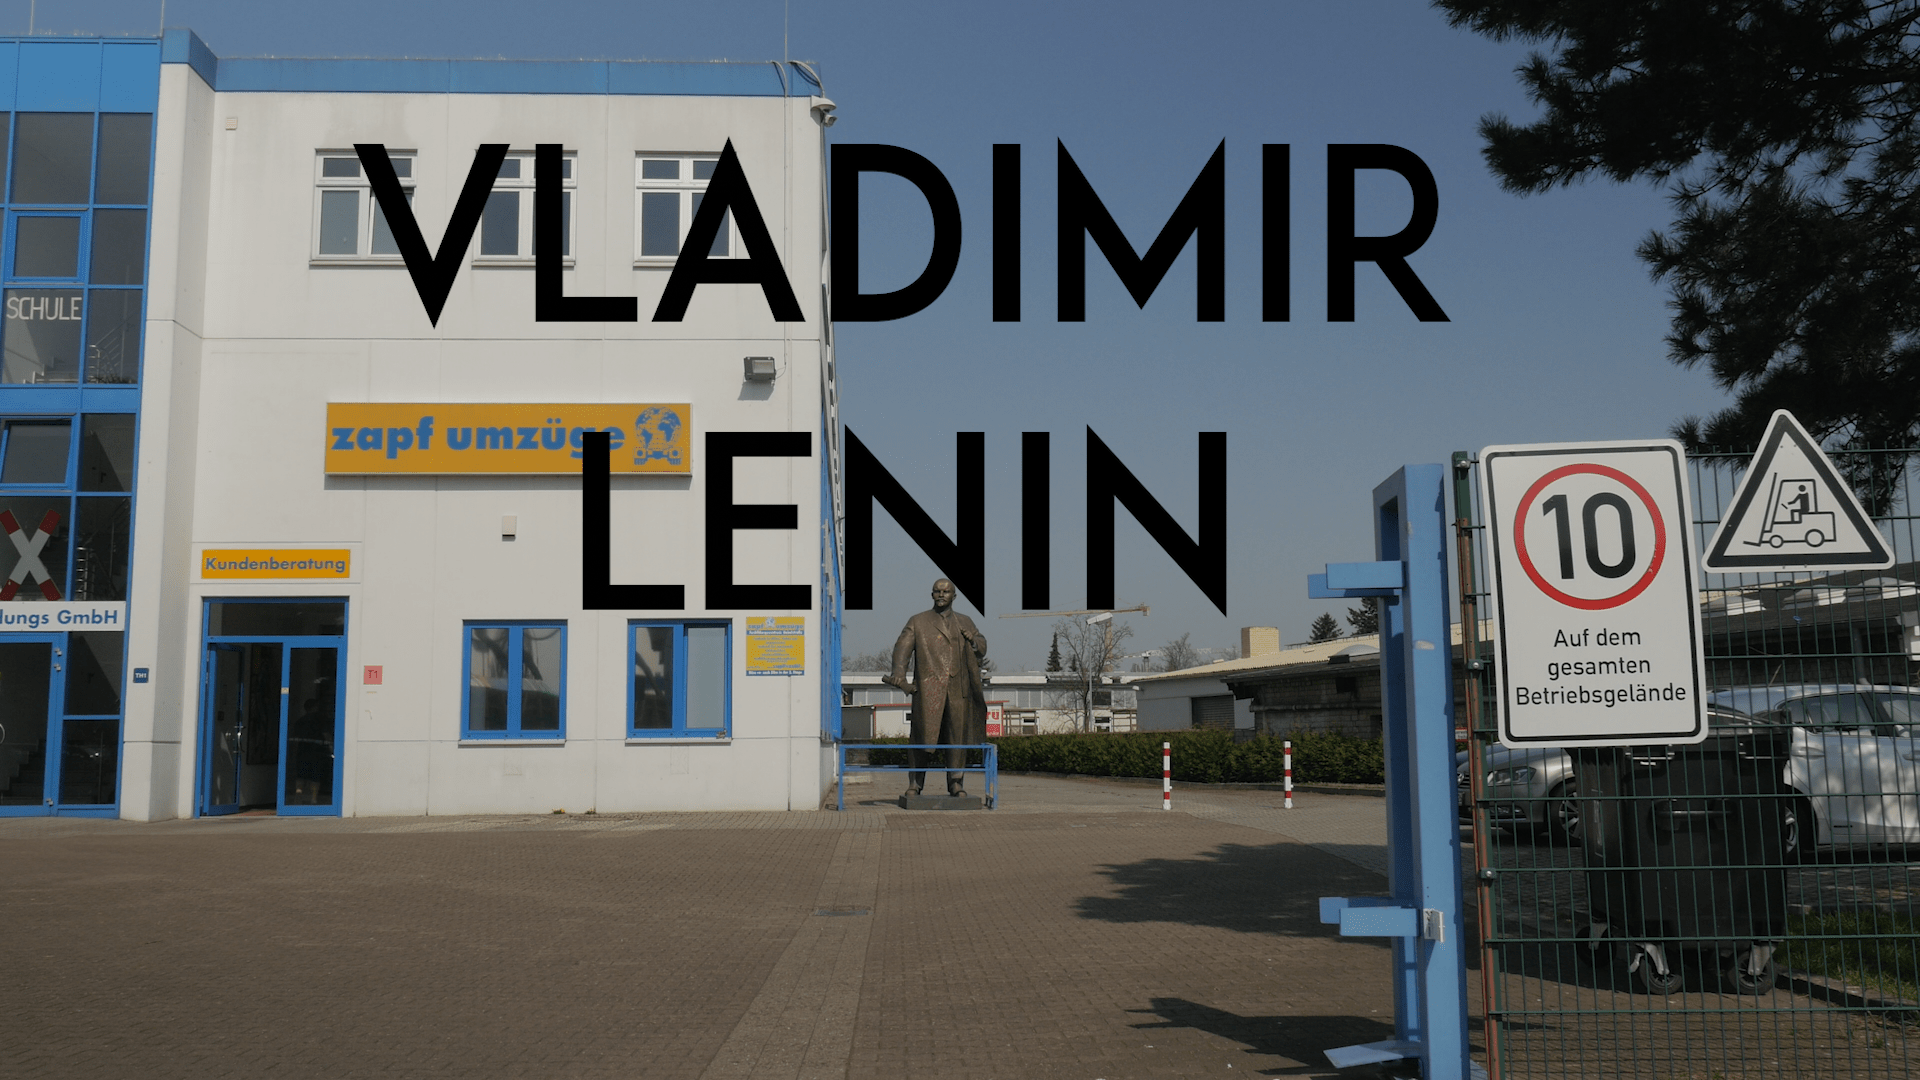 Lenin title